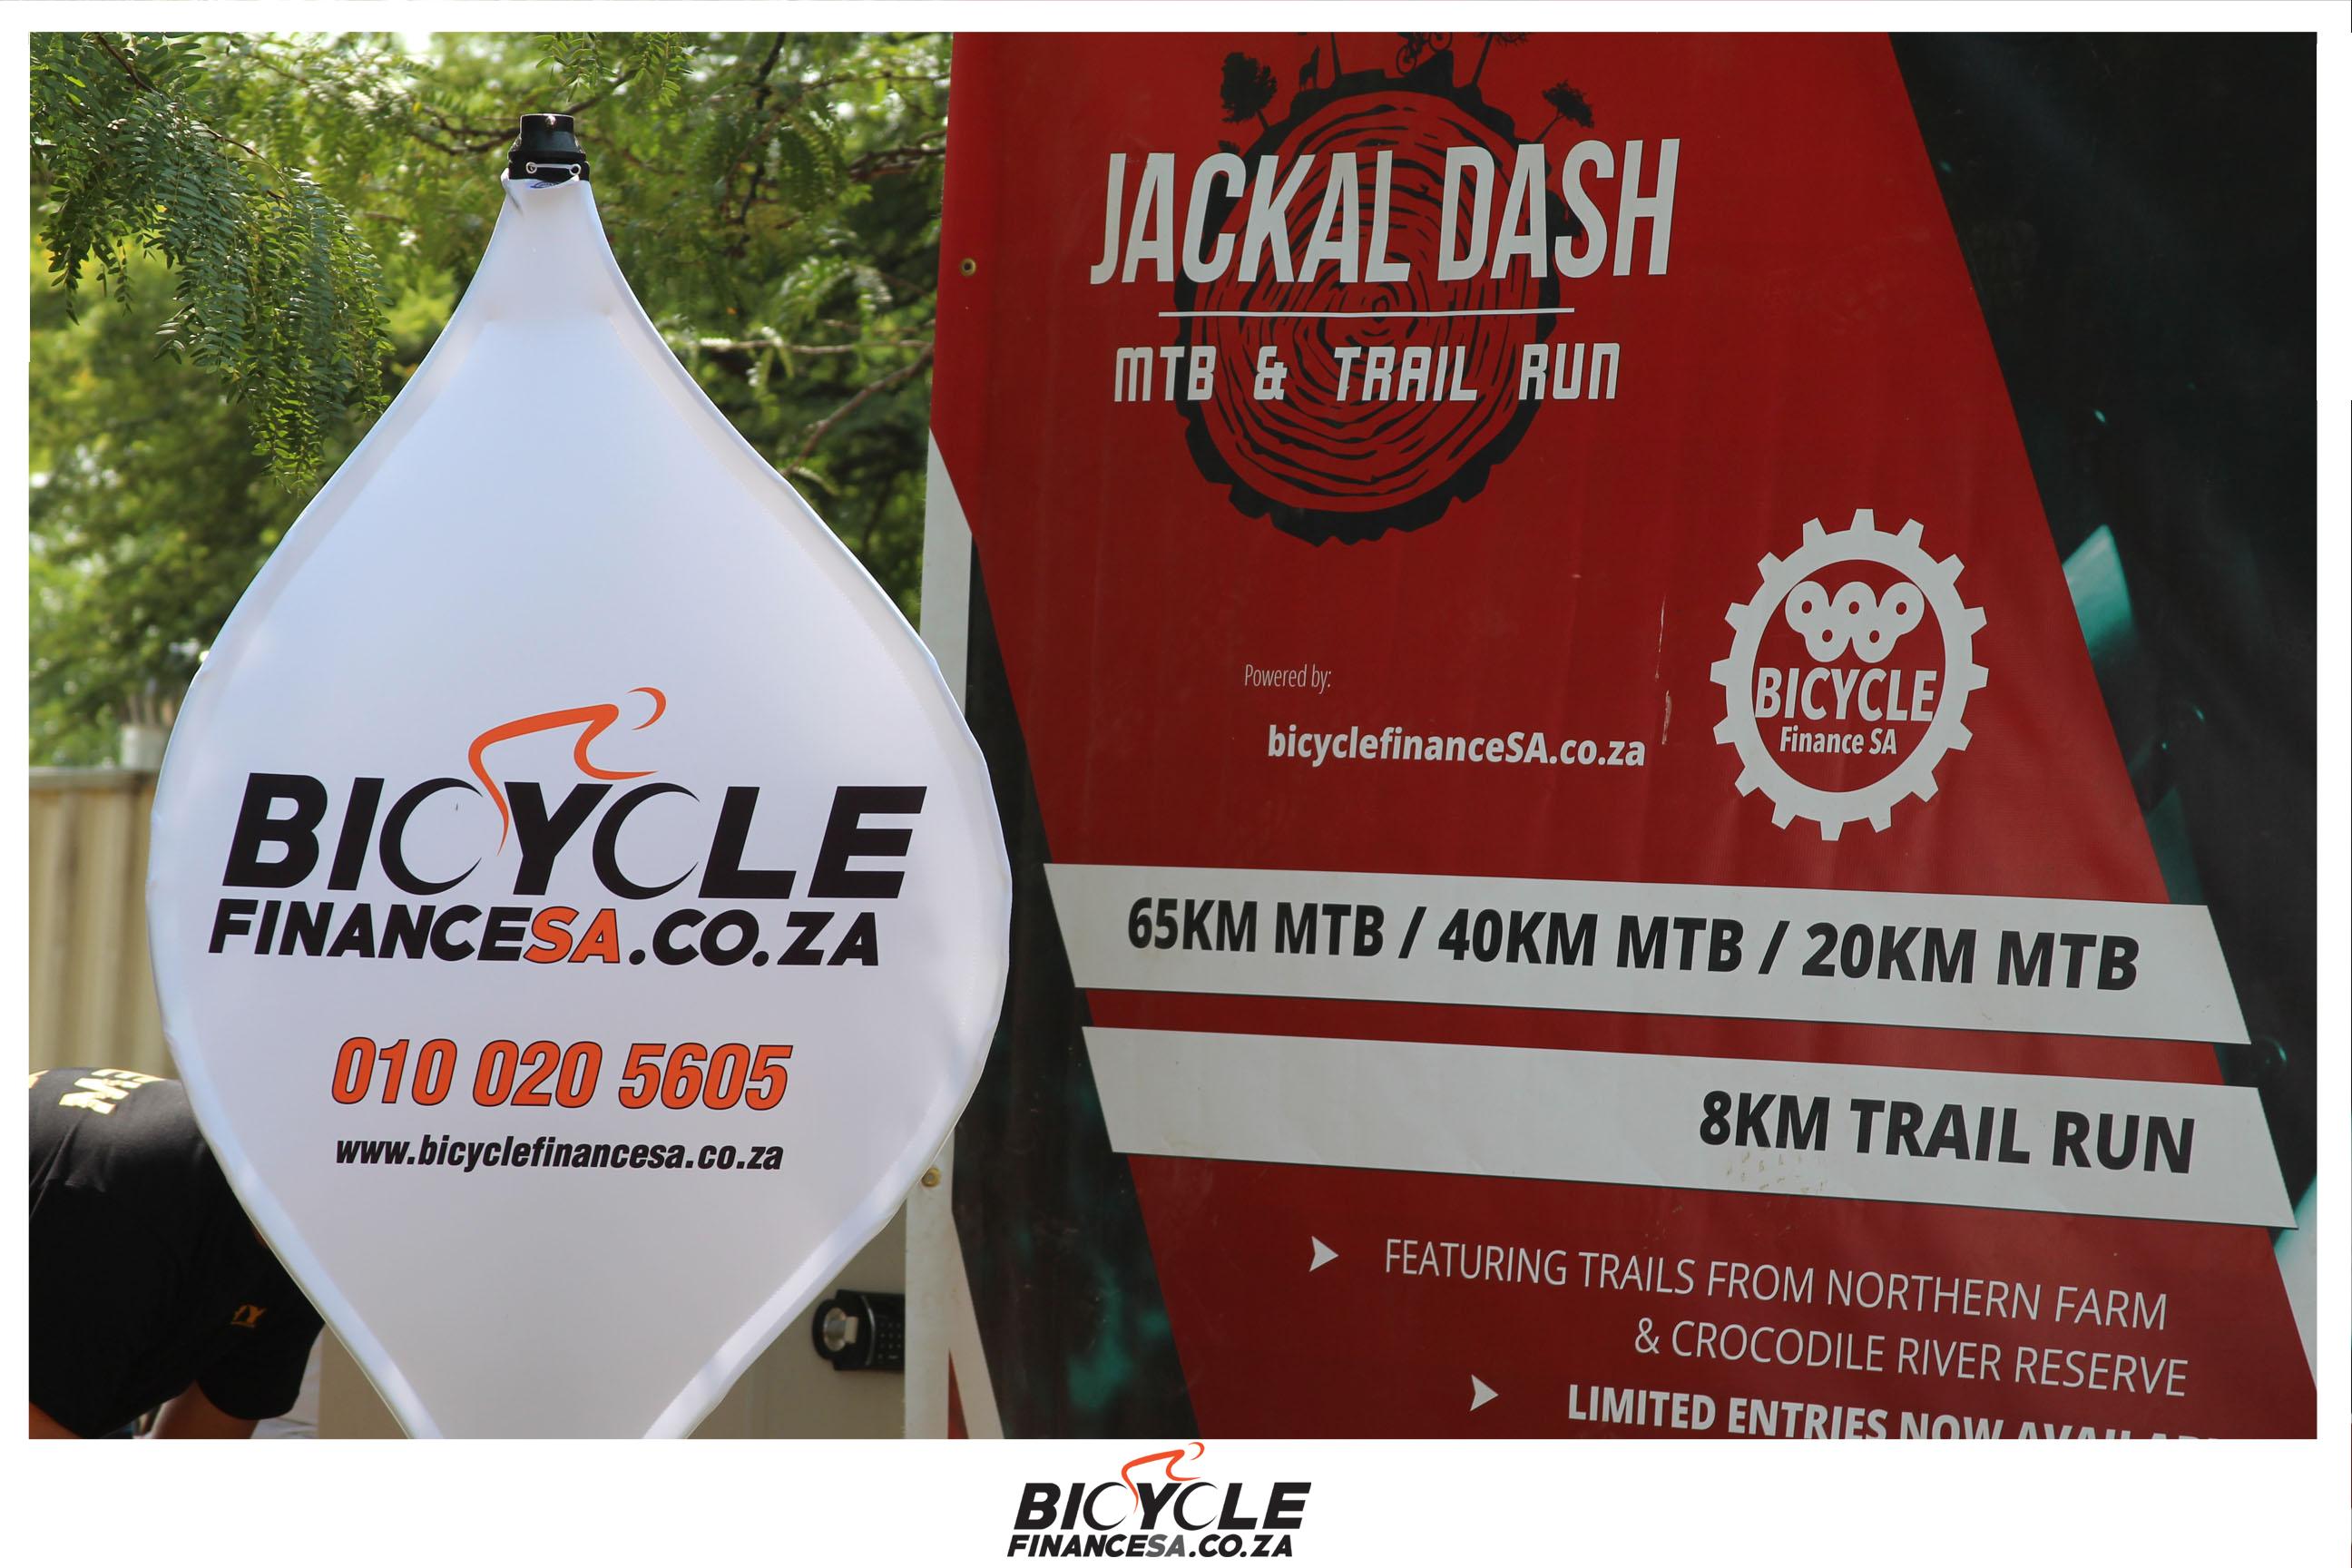 Jackal dash2019021243